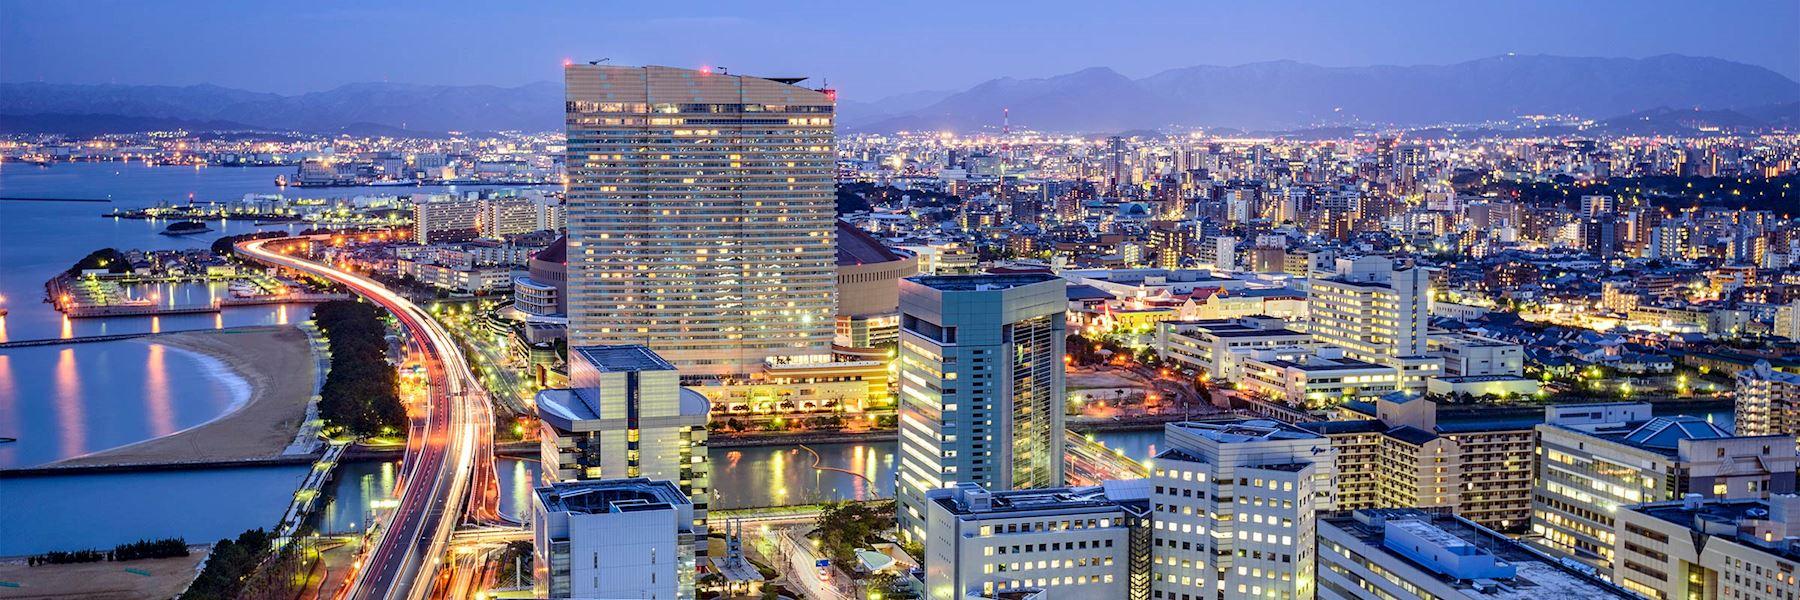 Visit Fukuoka, Japan